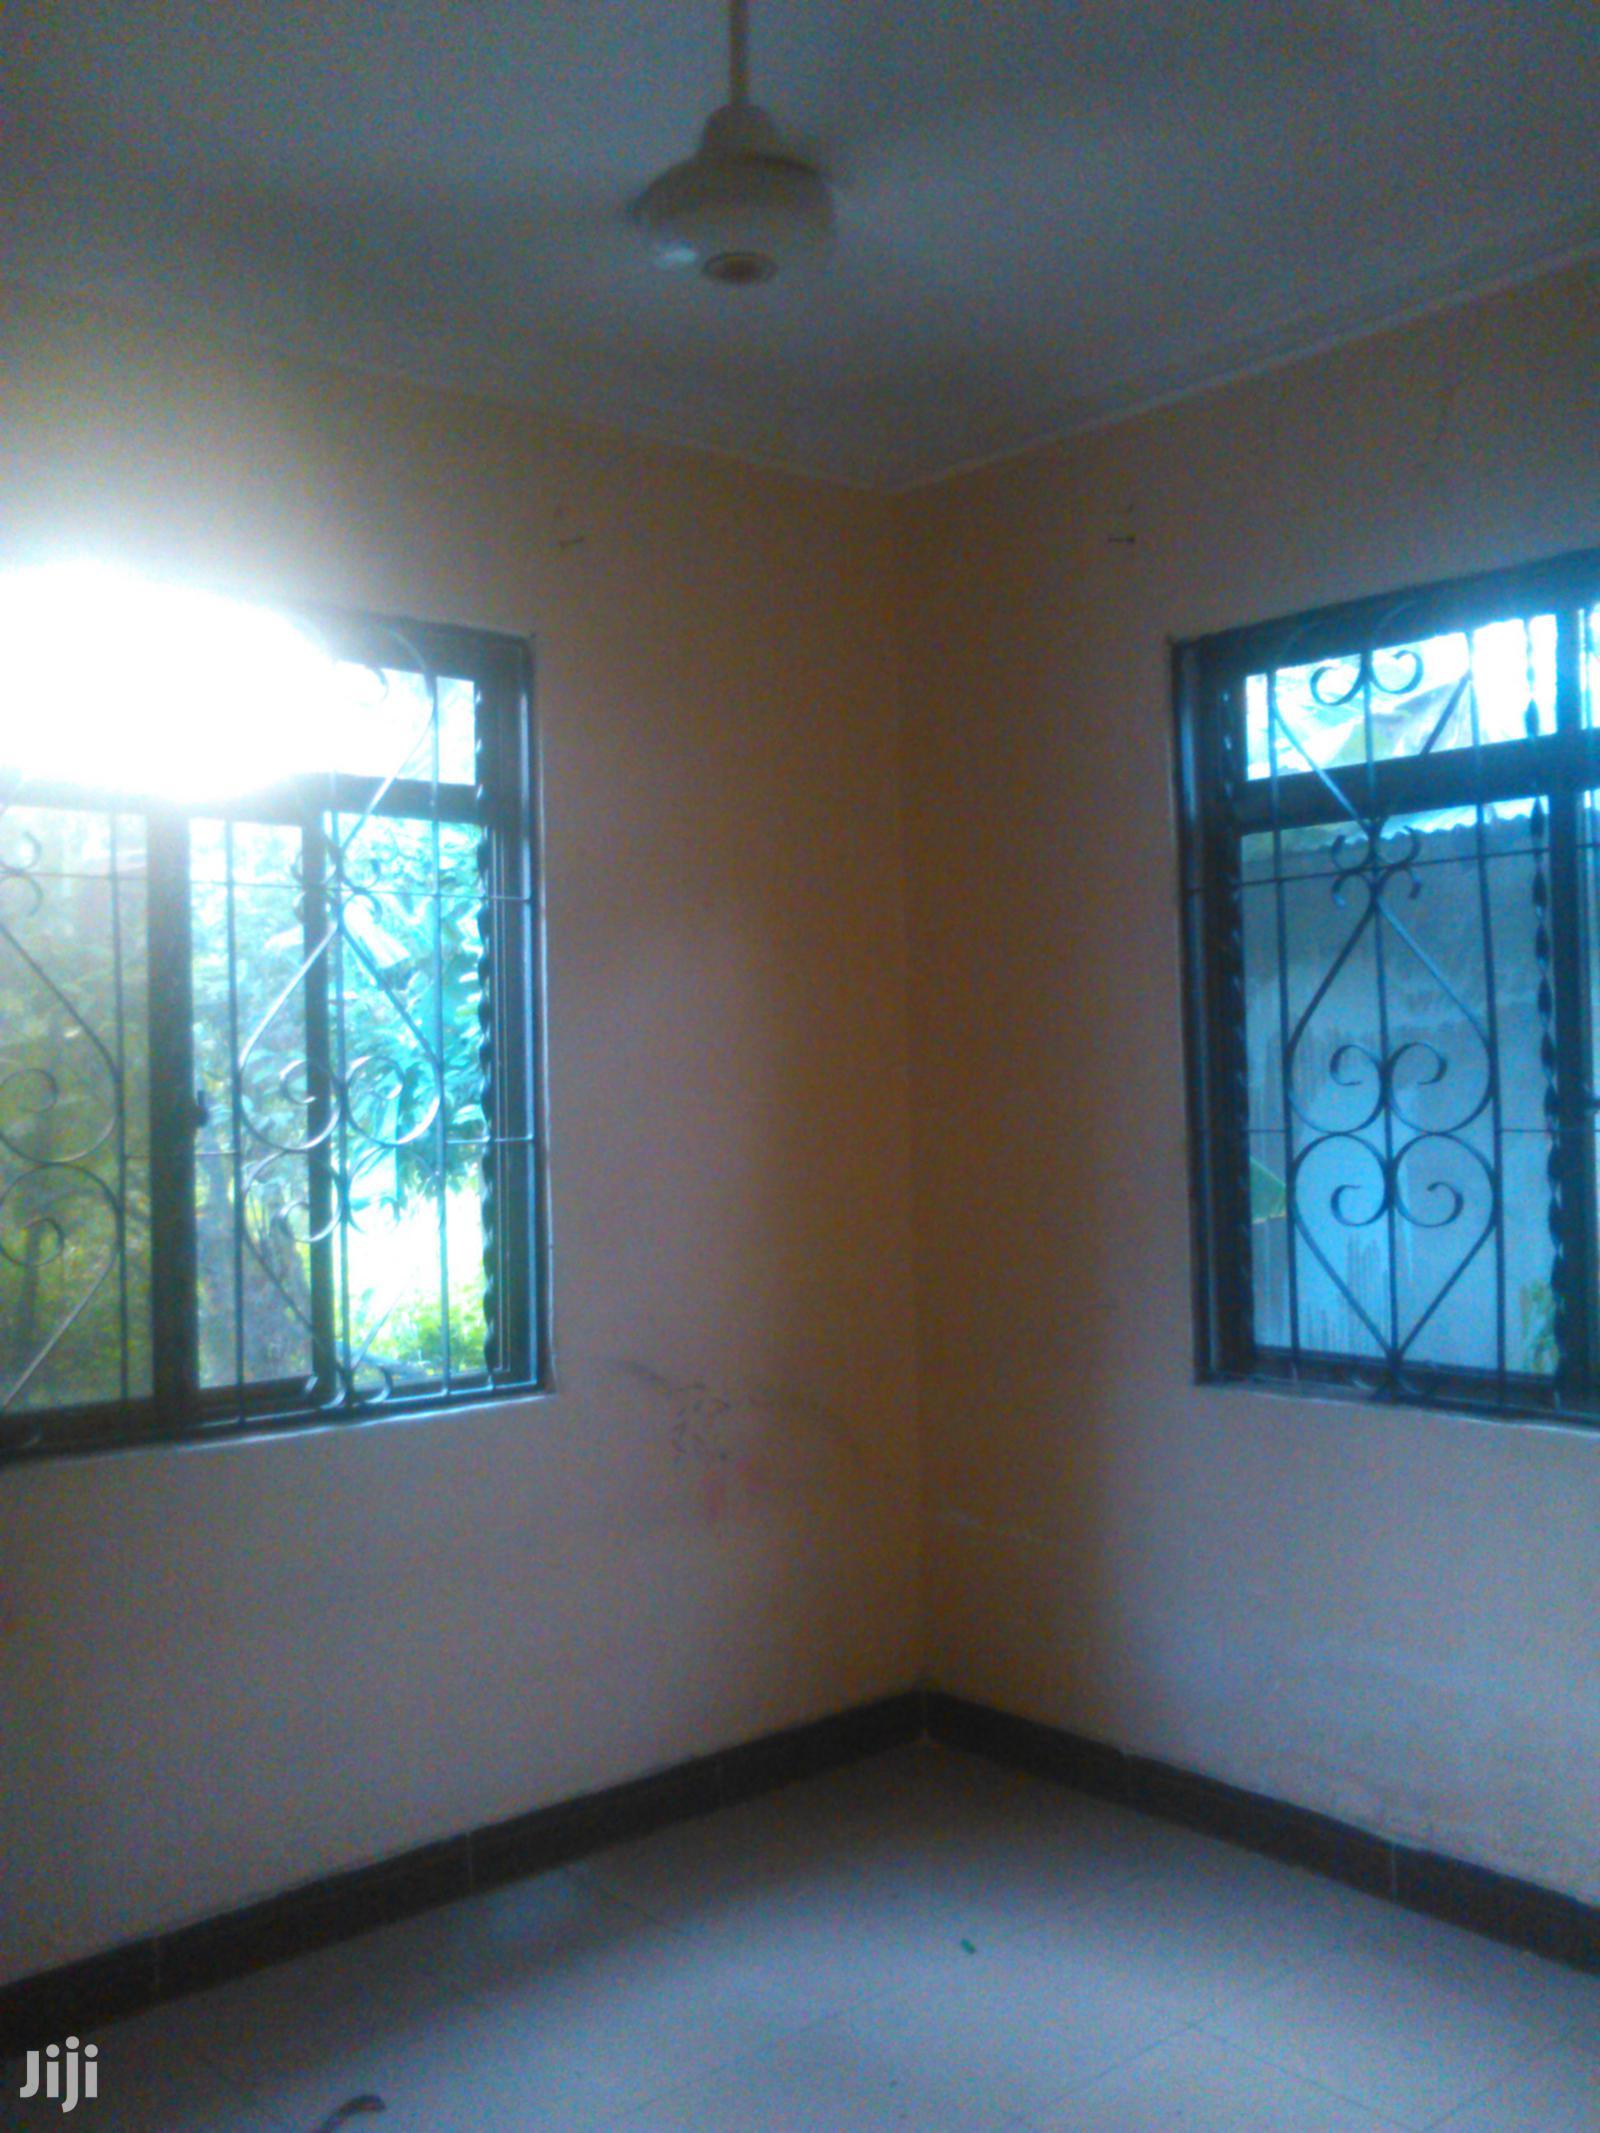 2 Bedroom,Master,Sebule,Jiko,Public Toilet Na Car Parking | Houses & Apartments For Rent for sale in Kinondoni, Dar es Salaam, Tanzania